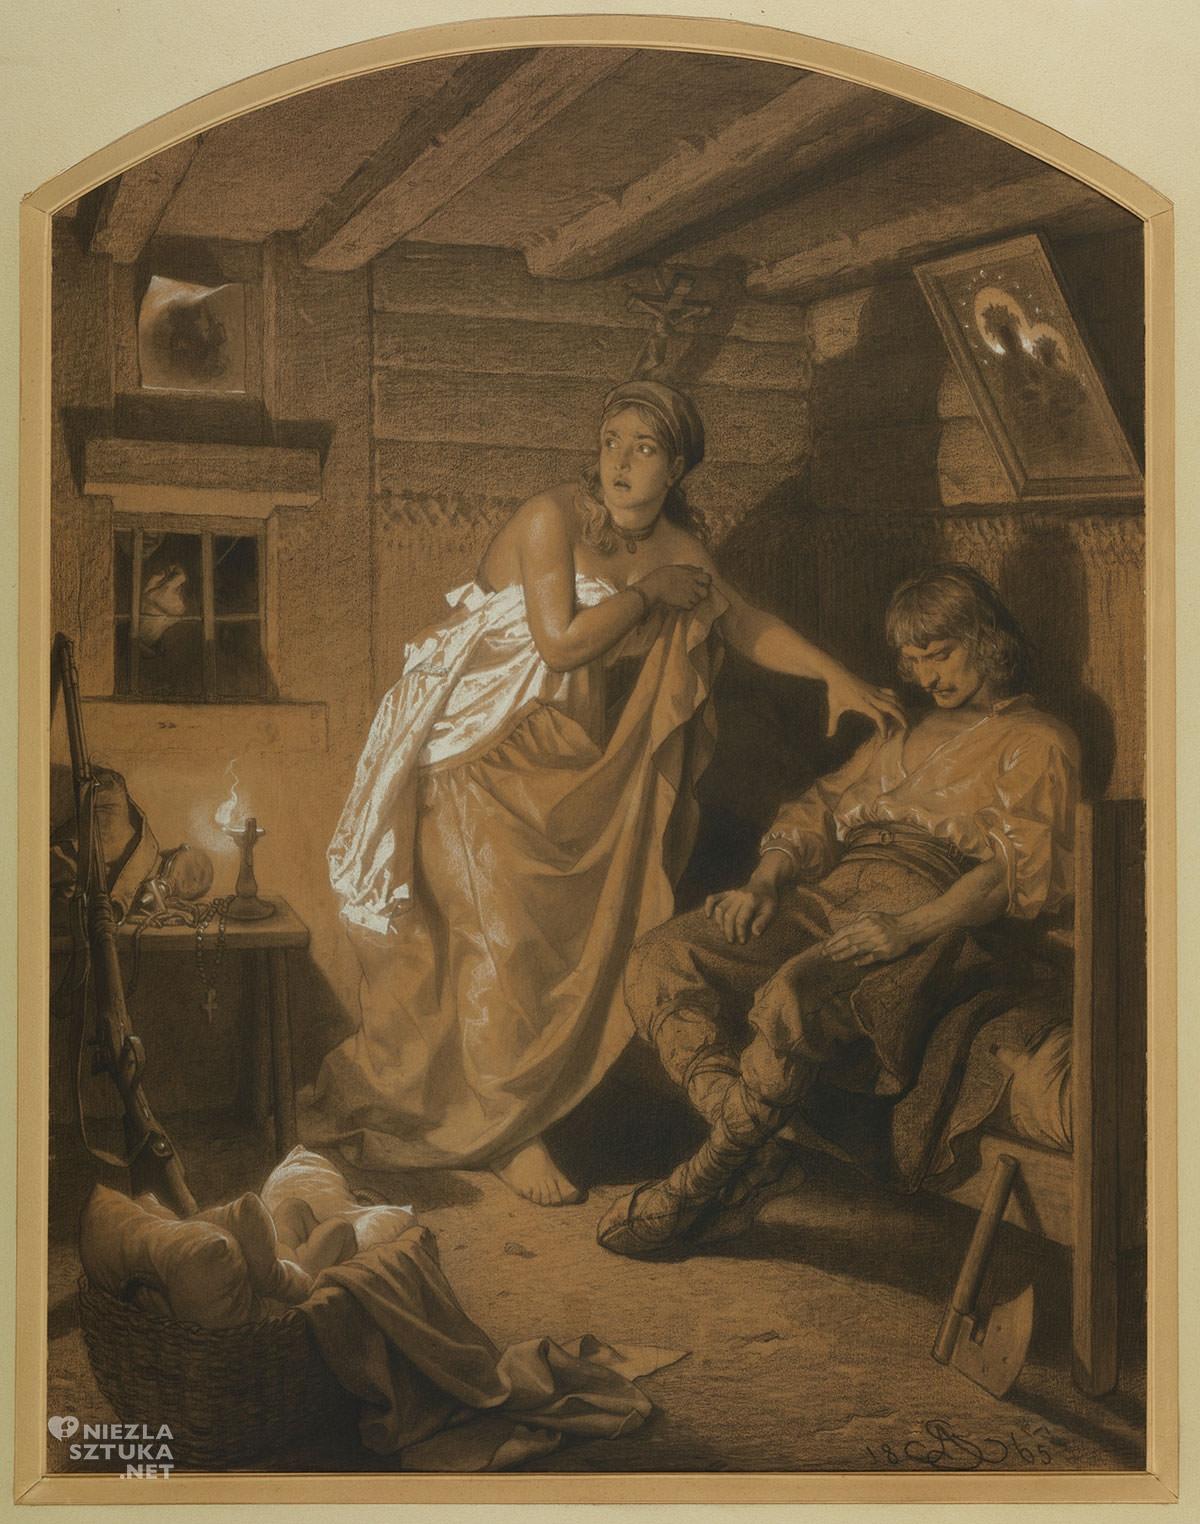 Artur Grottger, Znak, Lituania, sztuka polska, XIX wiek, Niezła Sztuka